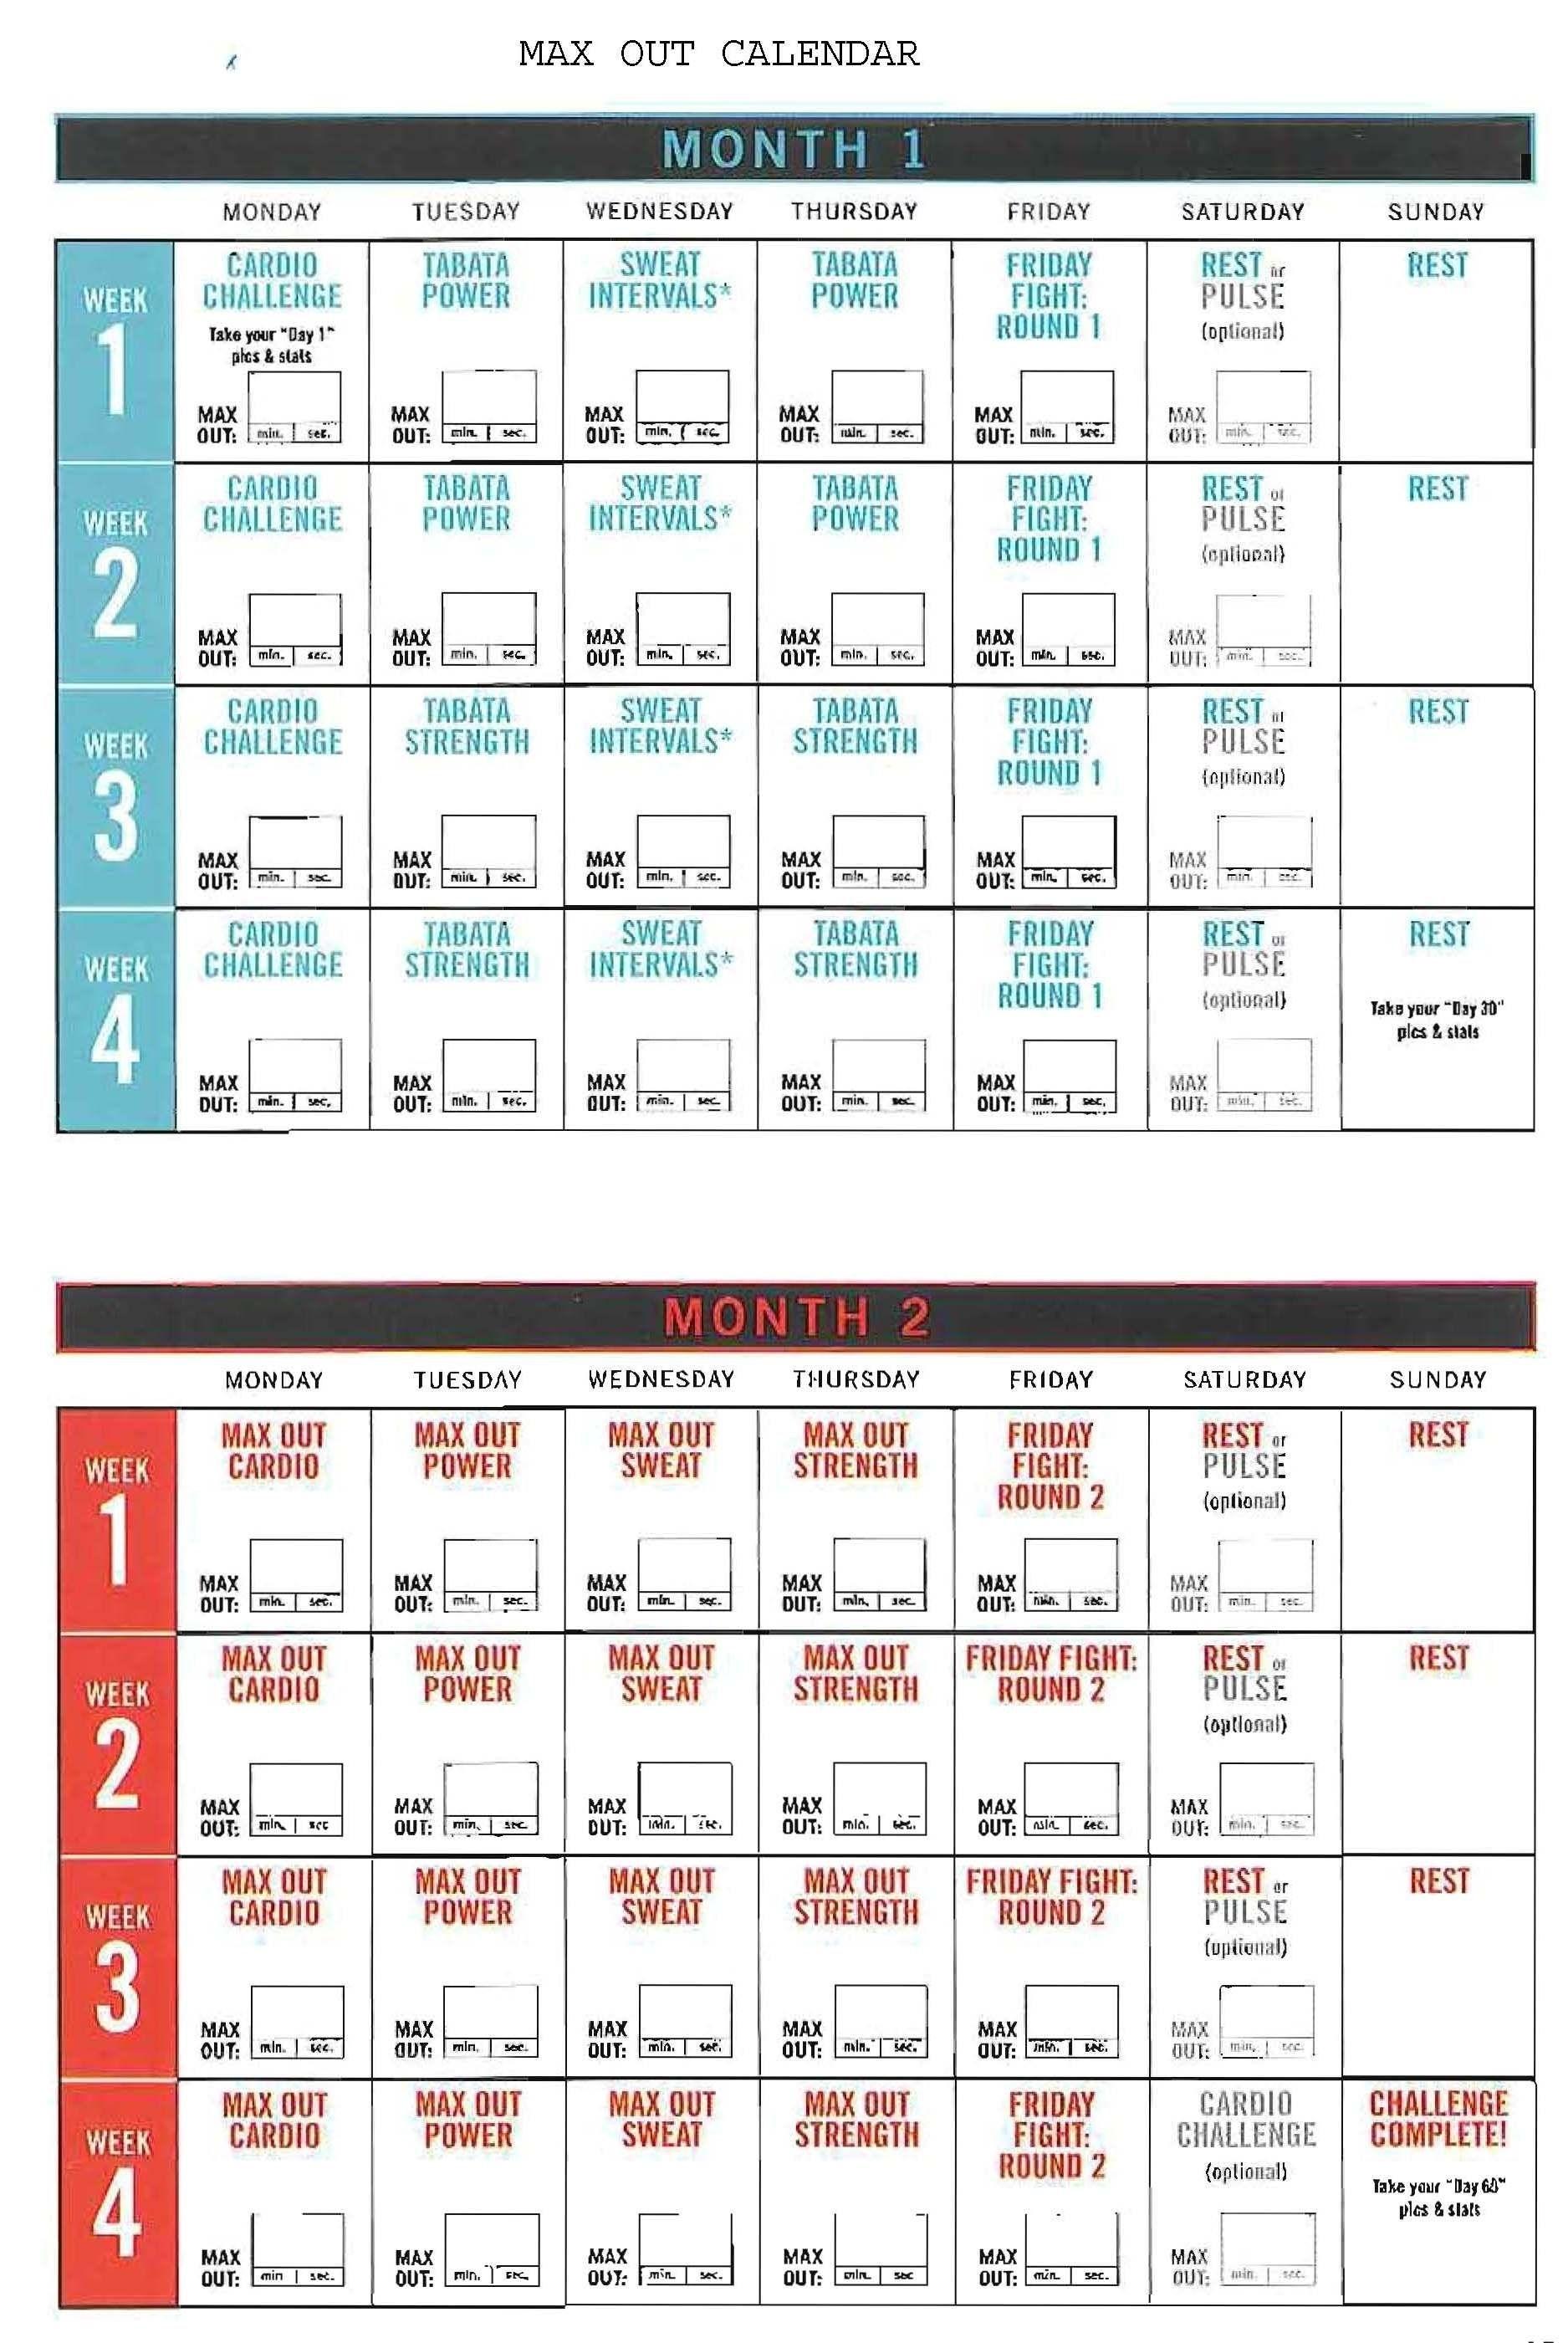 Insanity Max 30 Calendar Pdf | Template Calendar Printable pertaining to Insanity Max 30 Calendar Month 2